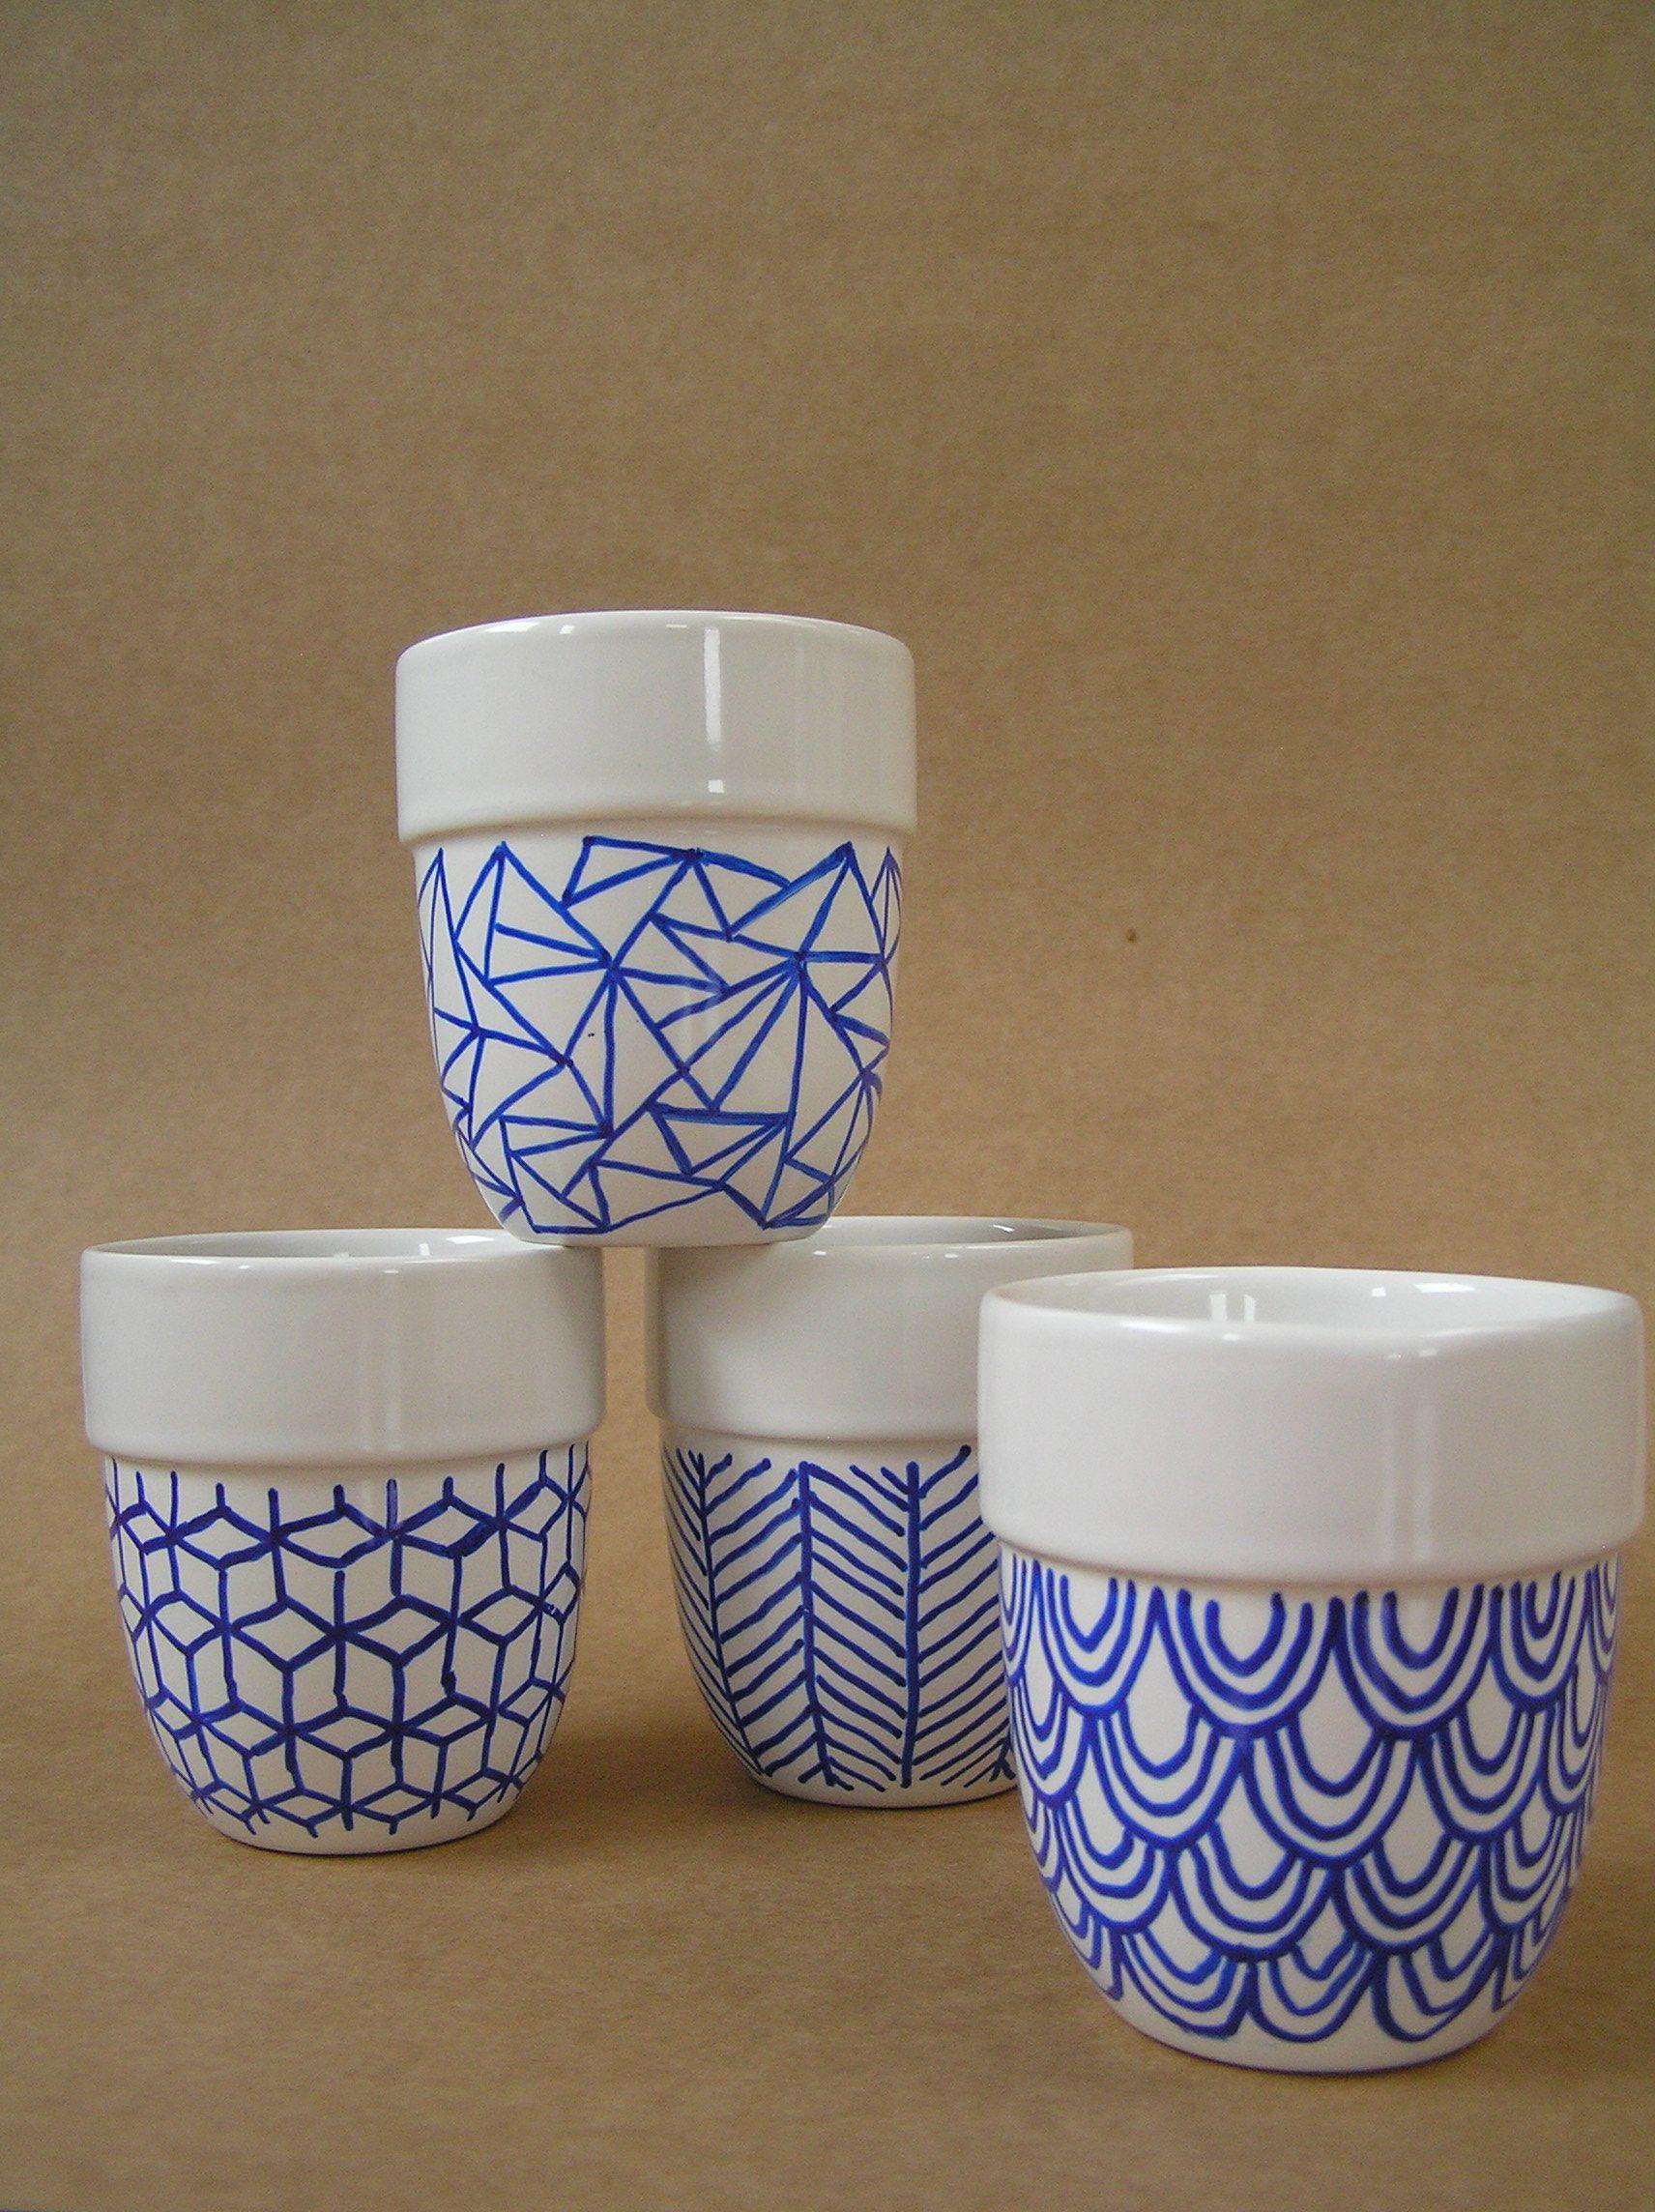 Ceramic graphics | Keramik bemalen, Geometrie und Geschirr